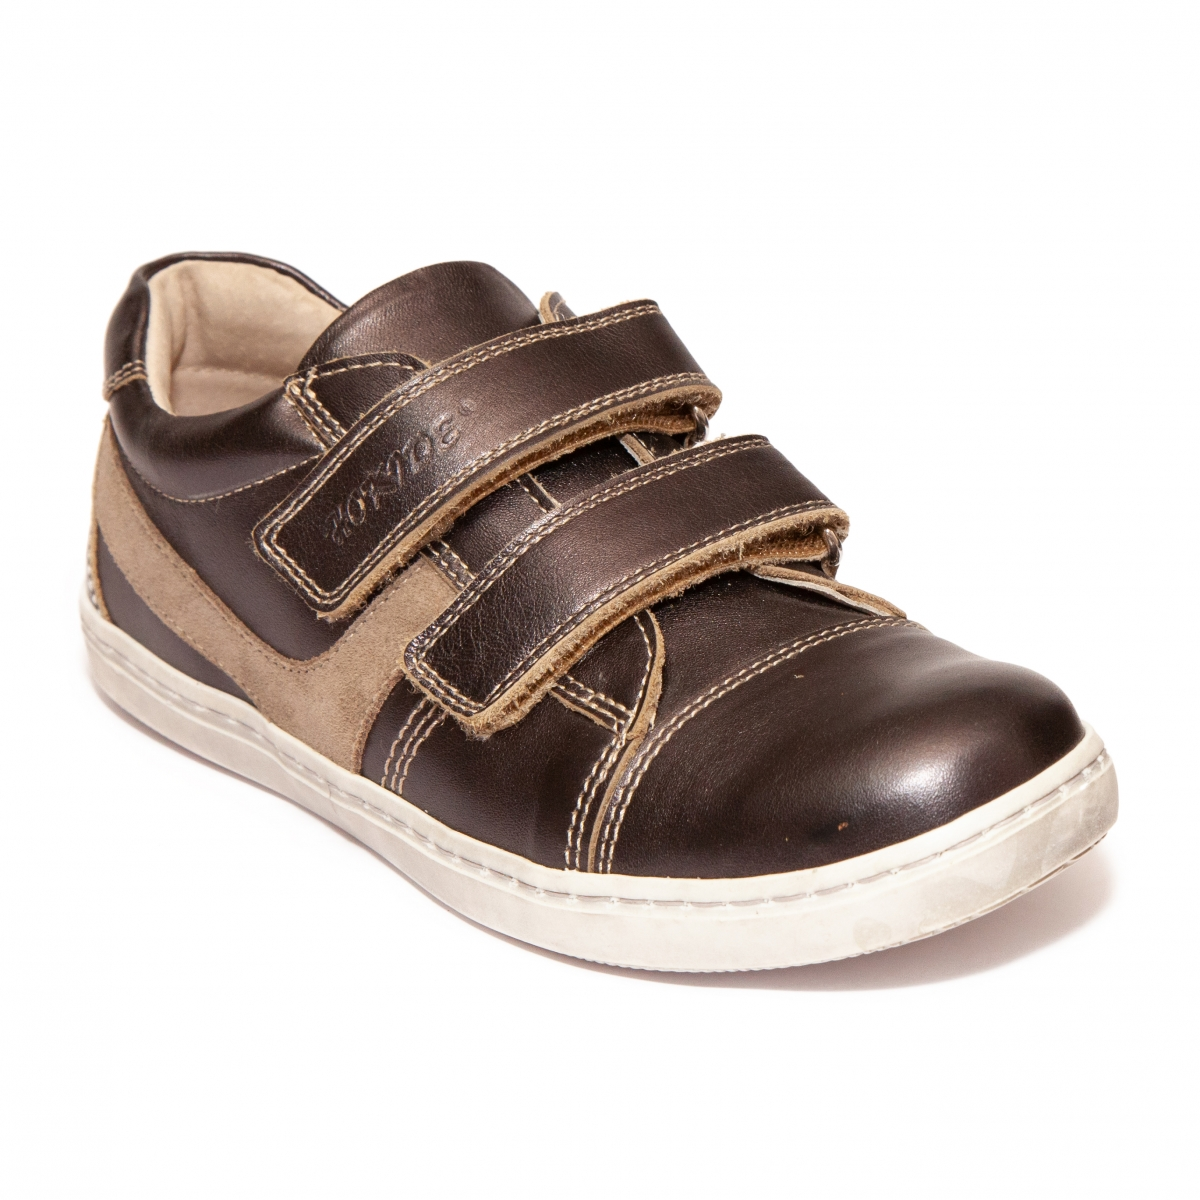 Pantofi copii sport hokide 398 maro 26-37